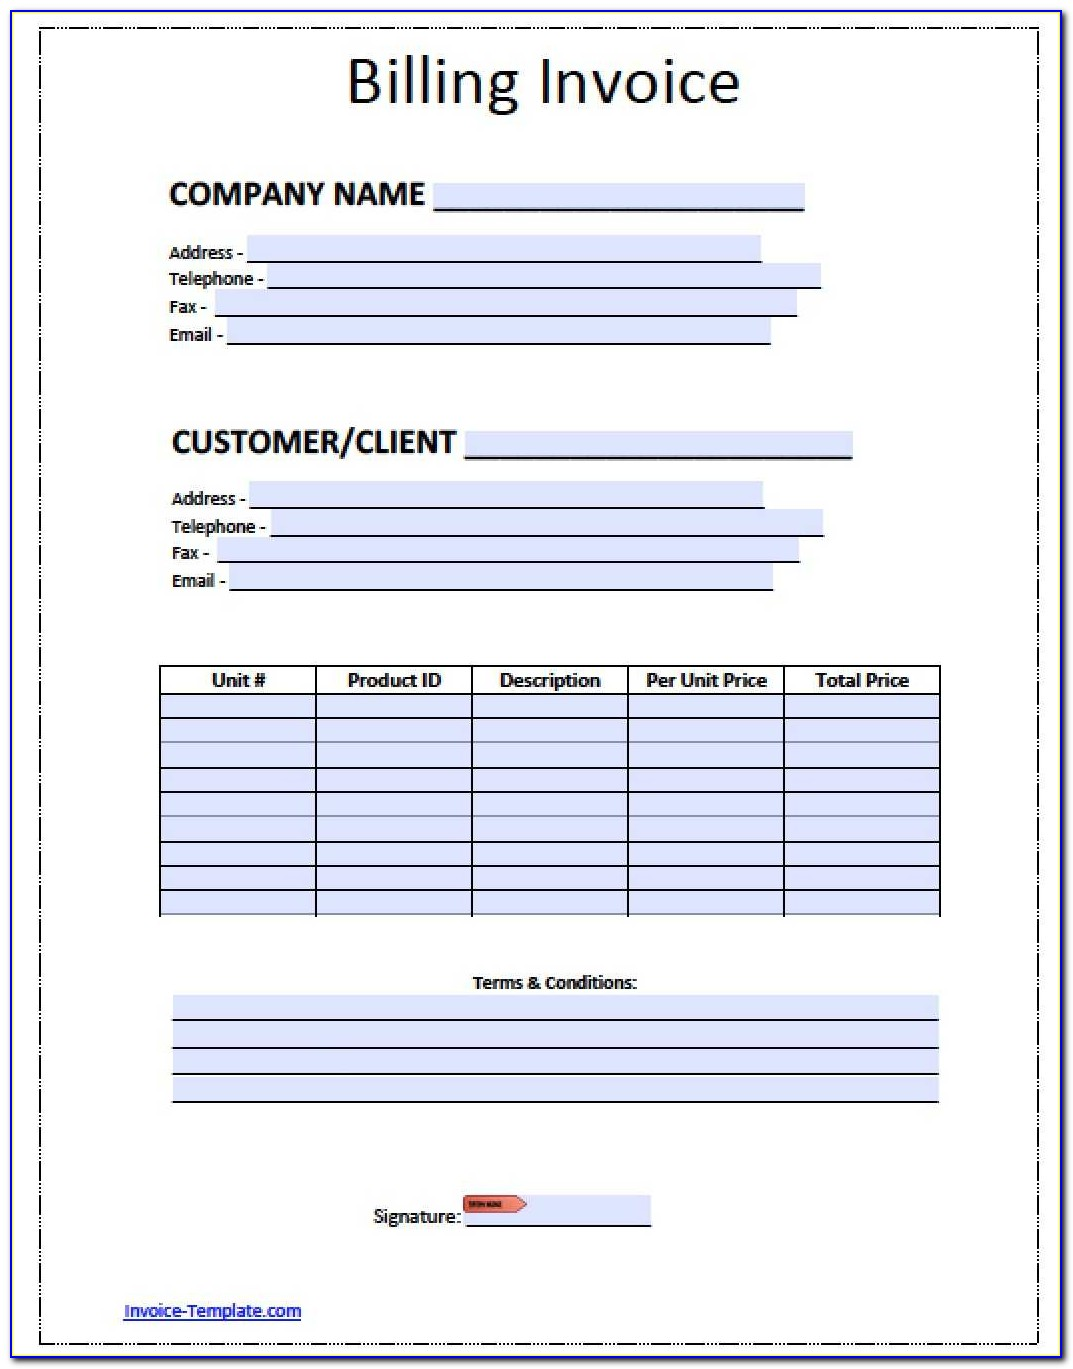 Free Invoice Templates Pdf